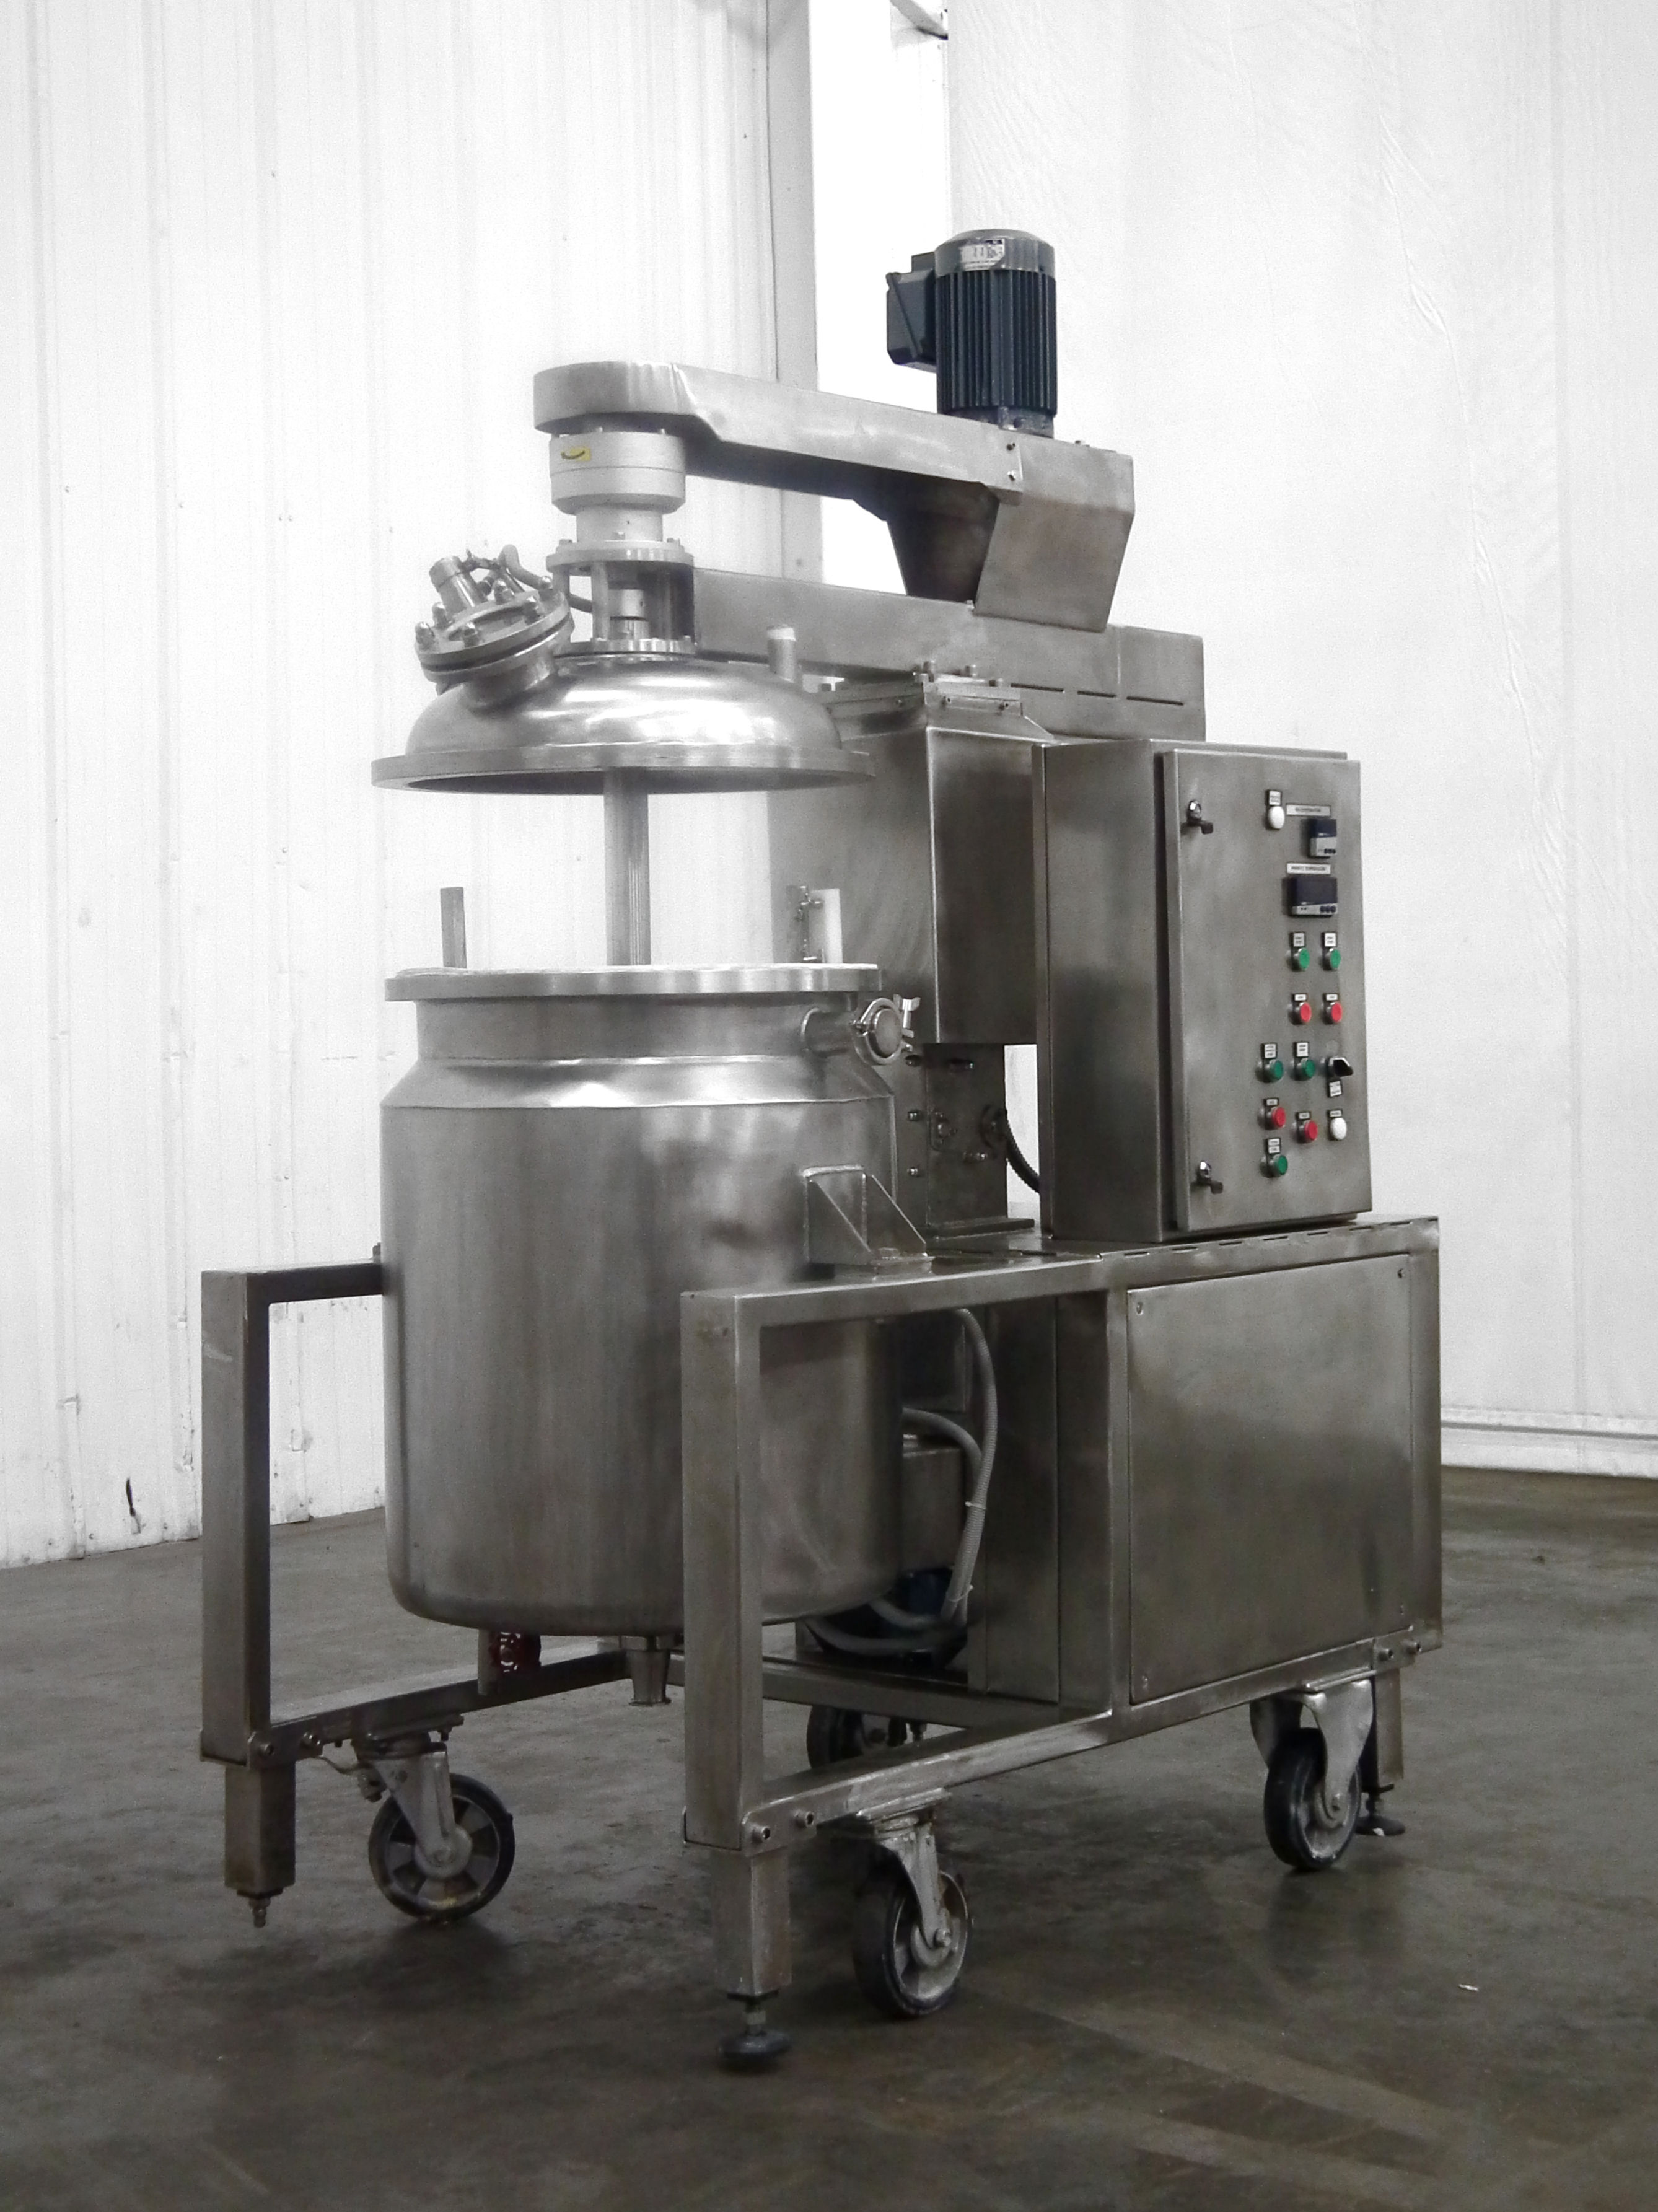 Mega Engineering HPE-VA 40 Gallon Pressure Mixer B3864 - Image 3 of 10